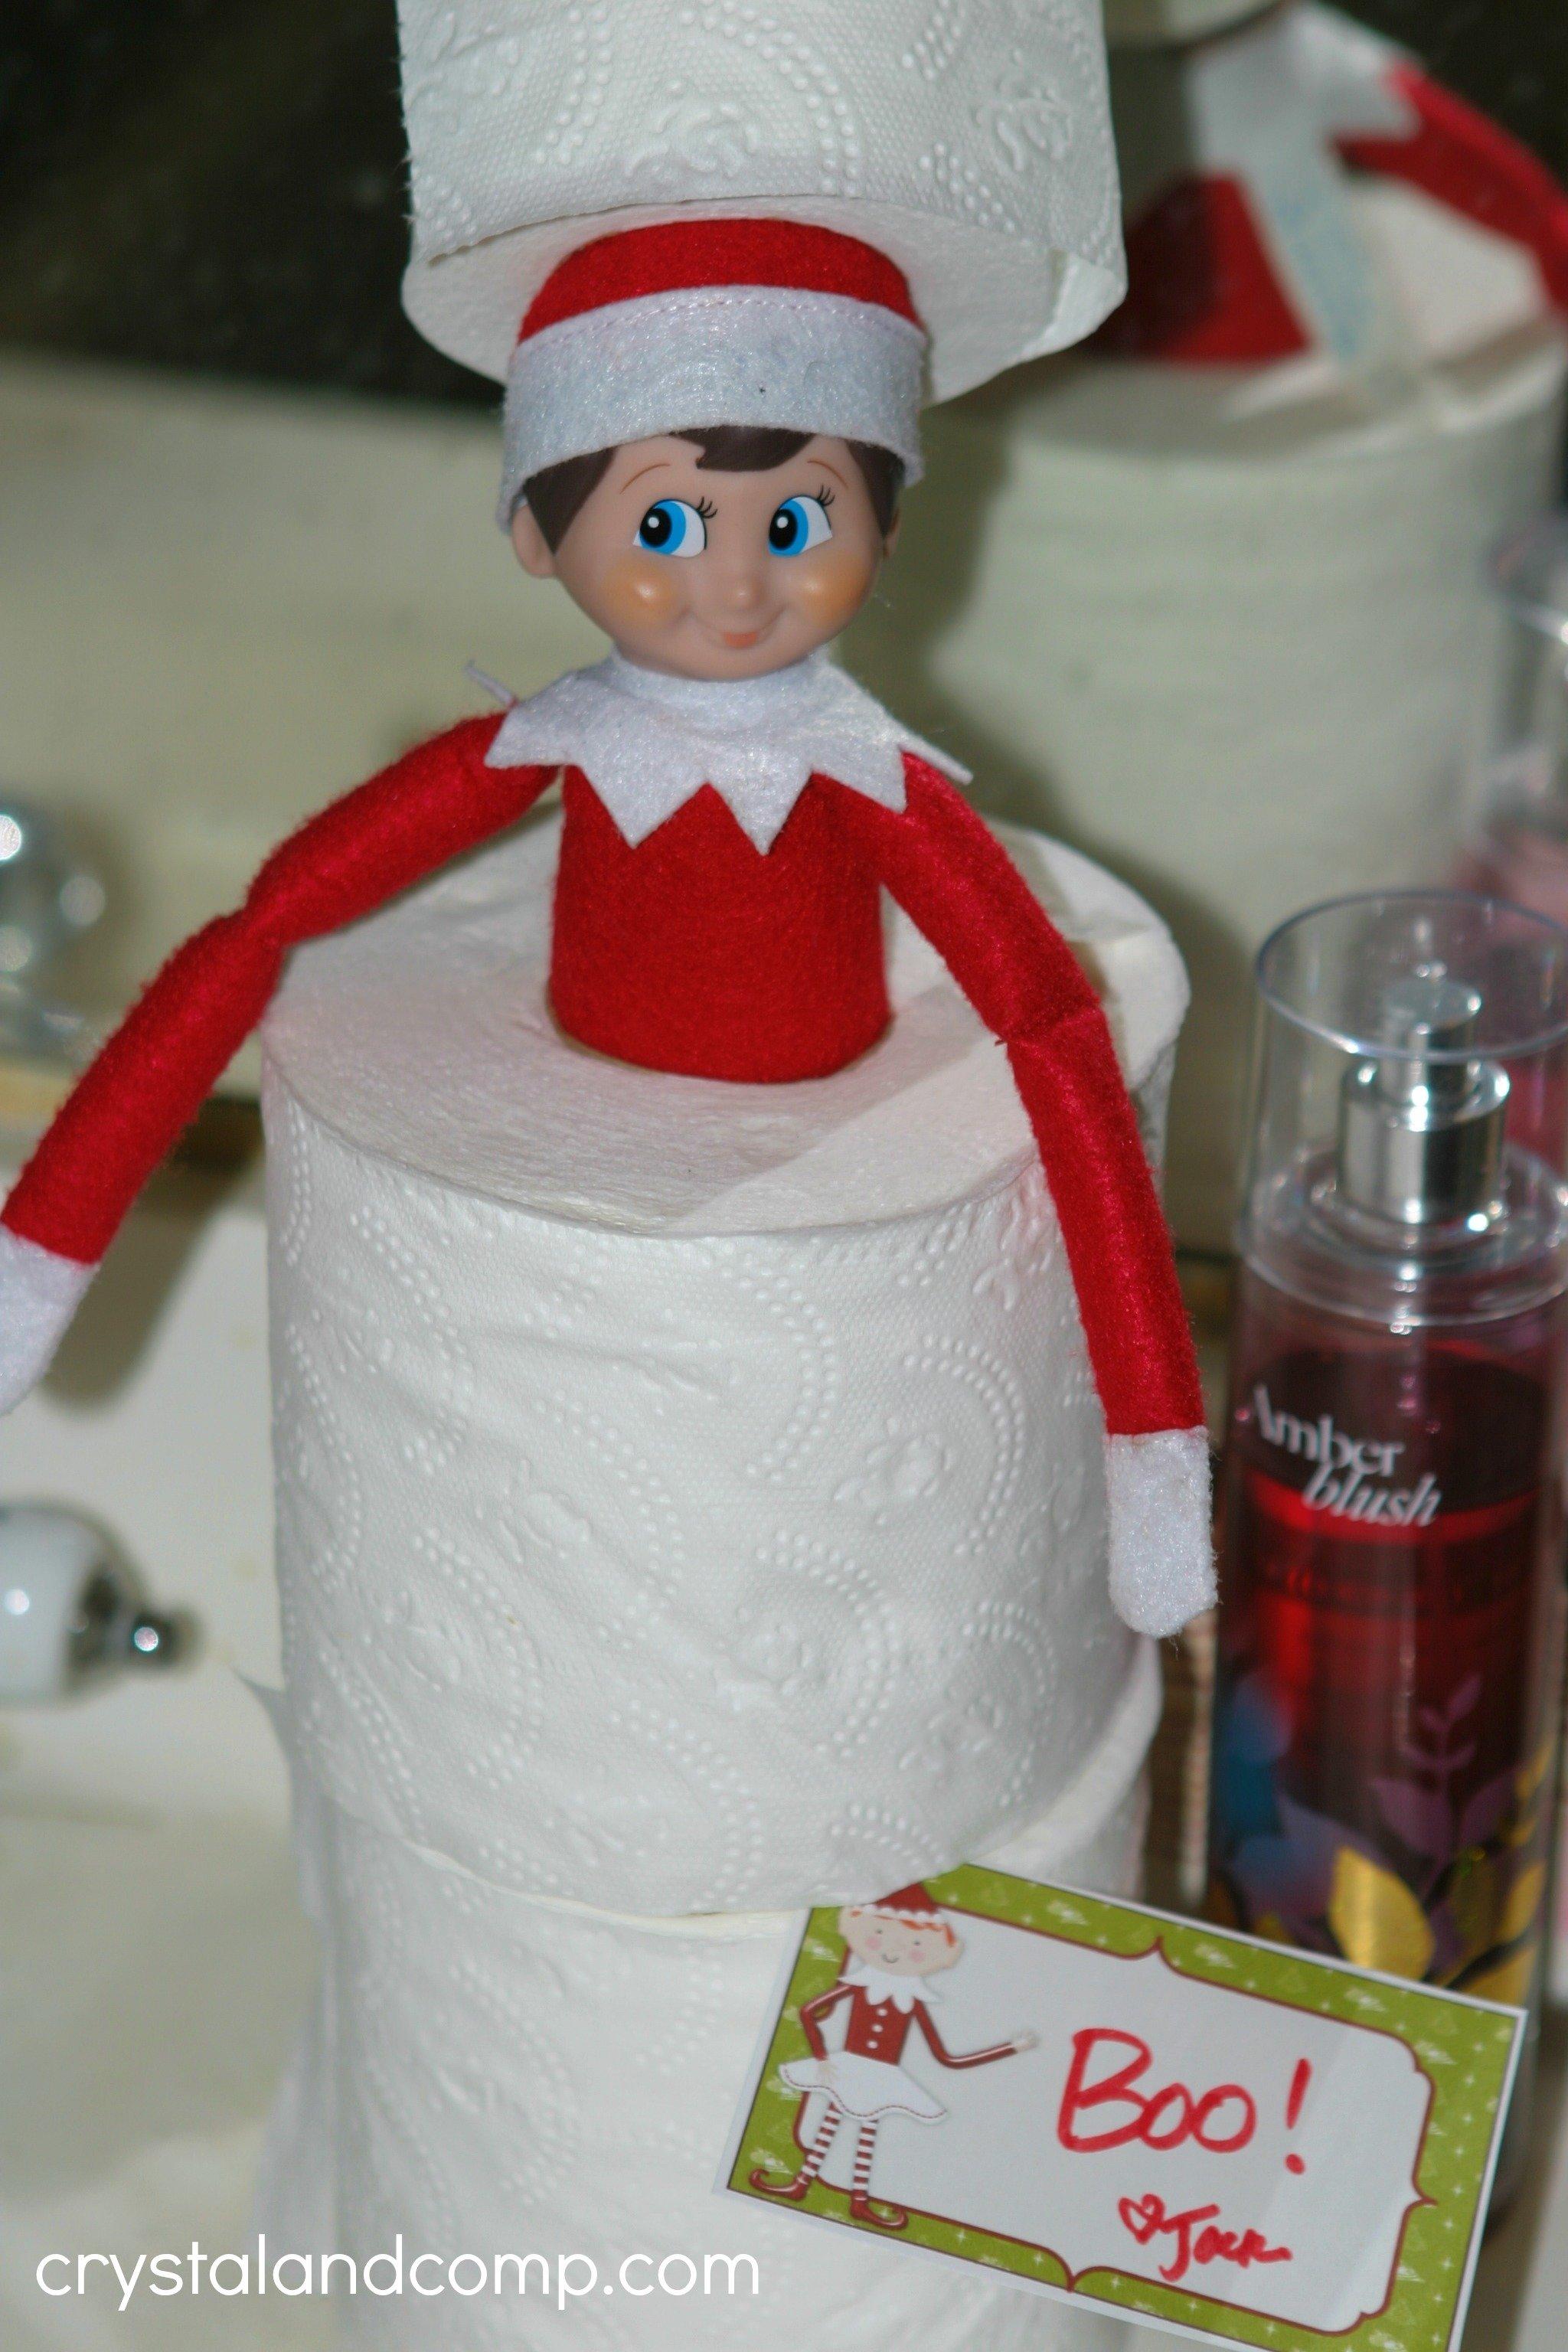 10 Stunning Ideas For Elf On Shelf elf on the shelf ideas using toilet paper 2